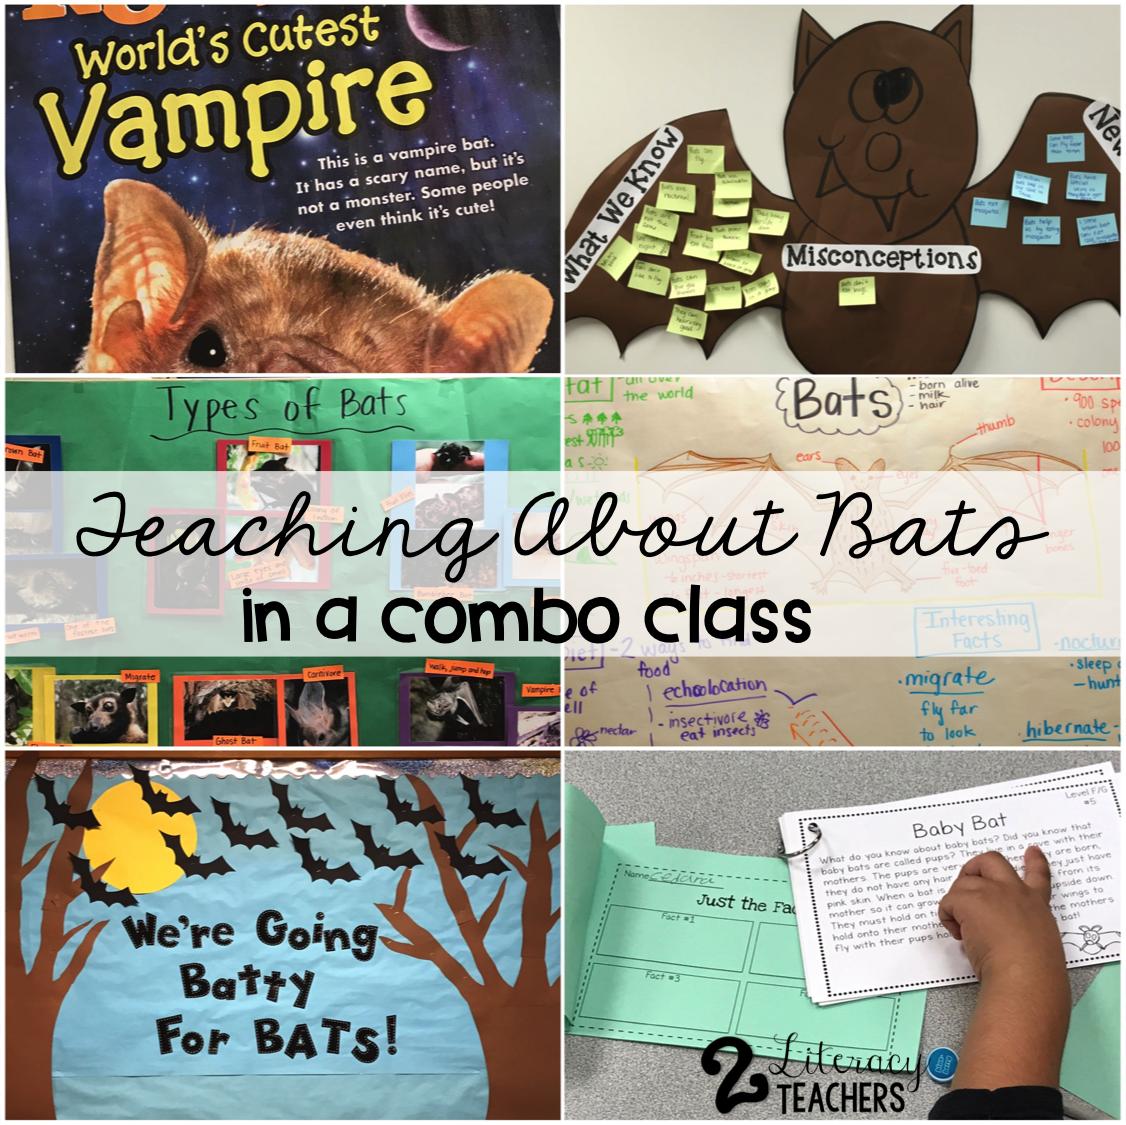 Teaching About Bats in a Combo Class